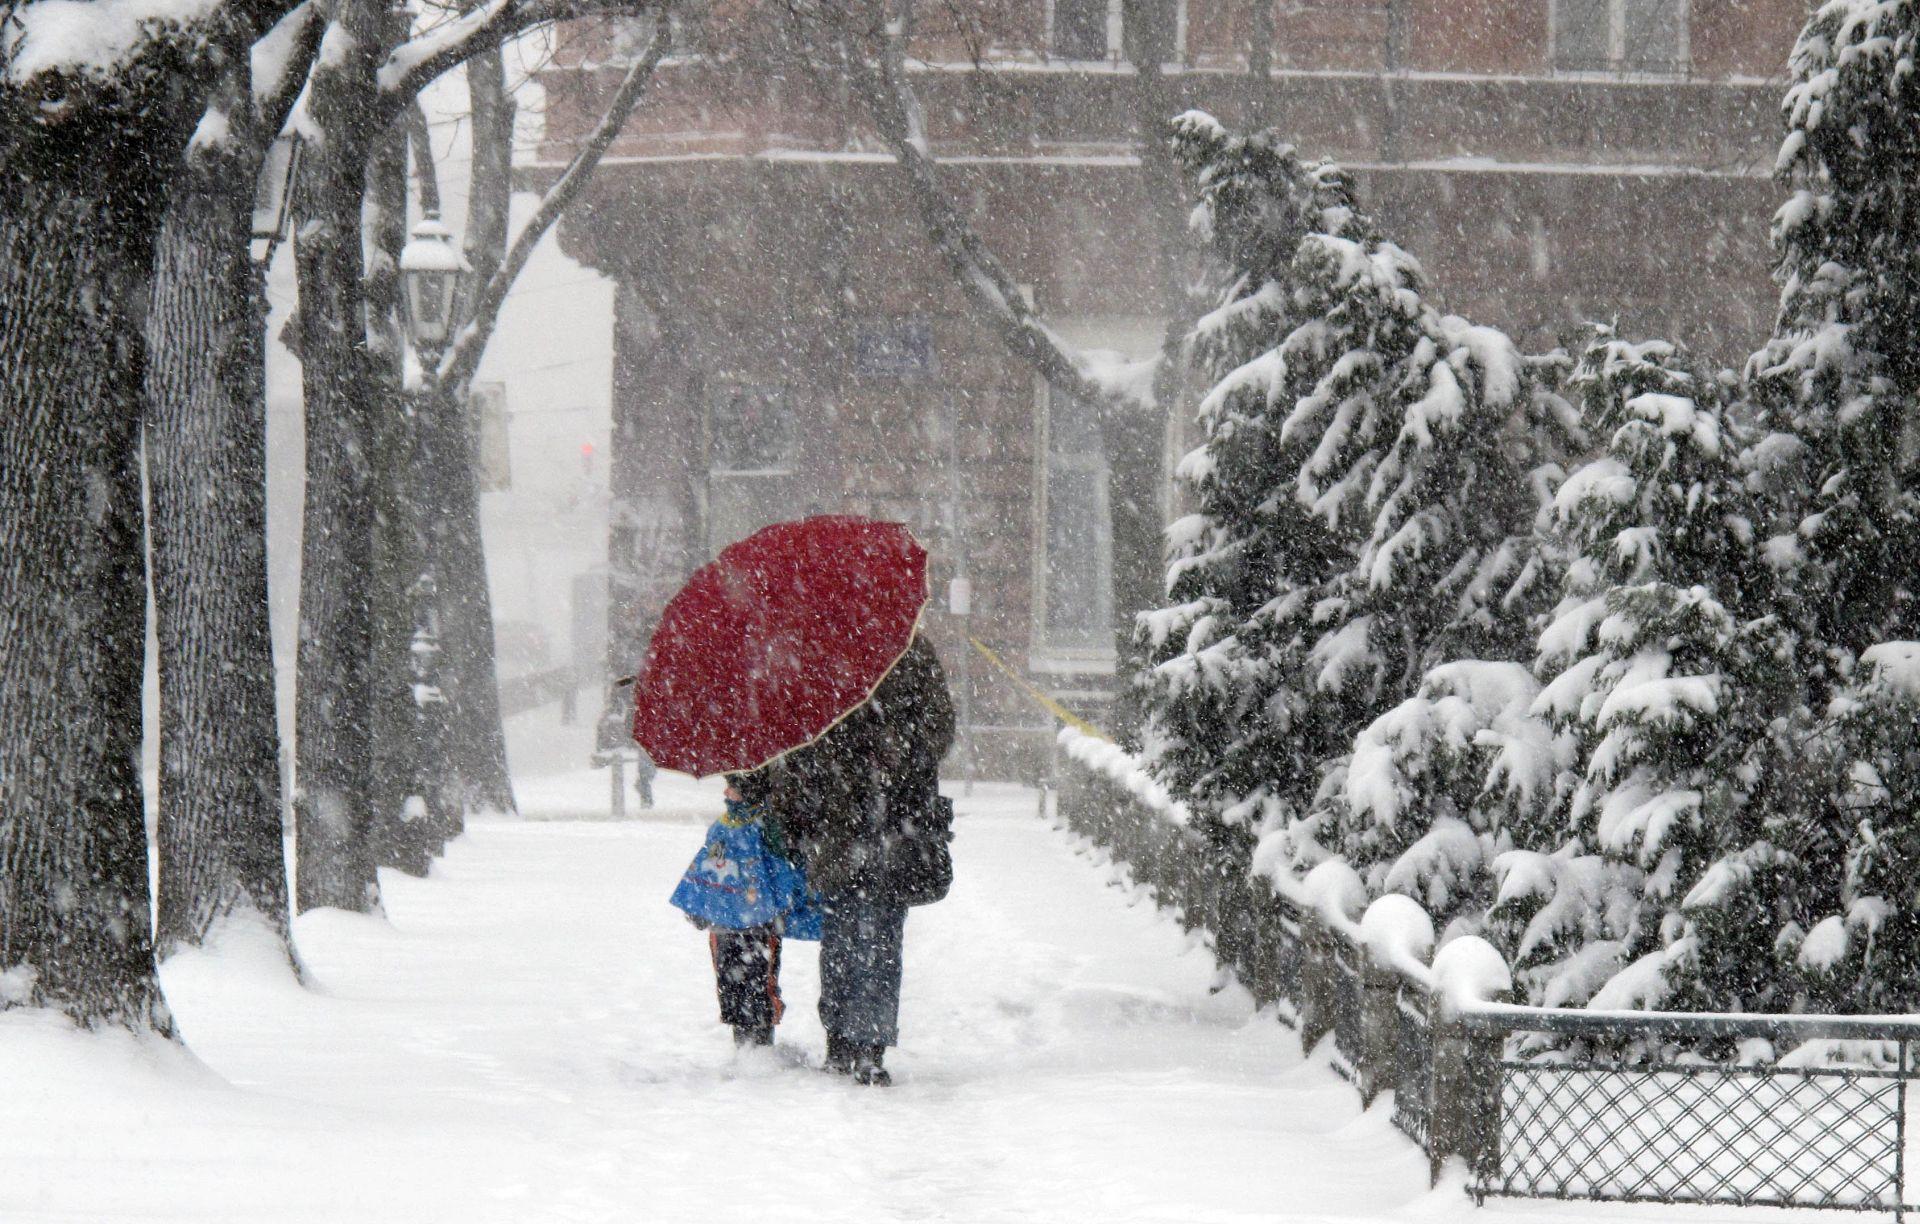 Još danas snijeg i ledena kiša, sutra porast temperatura